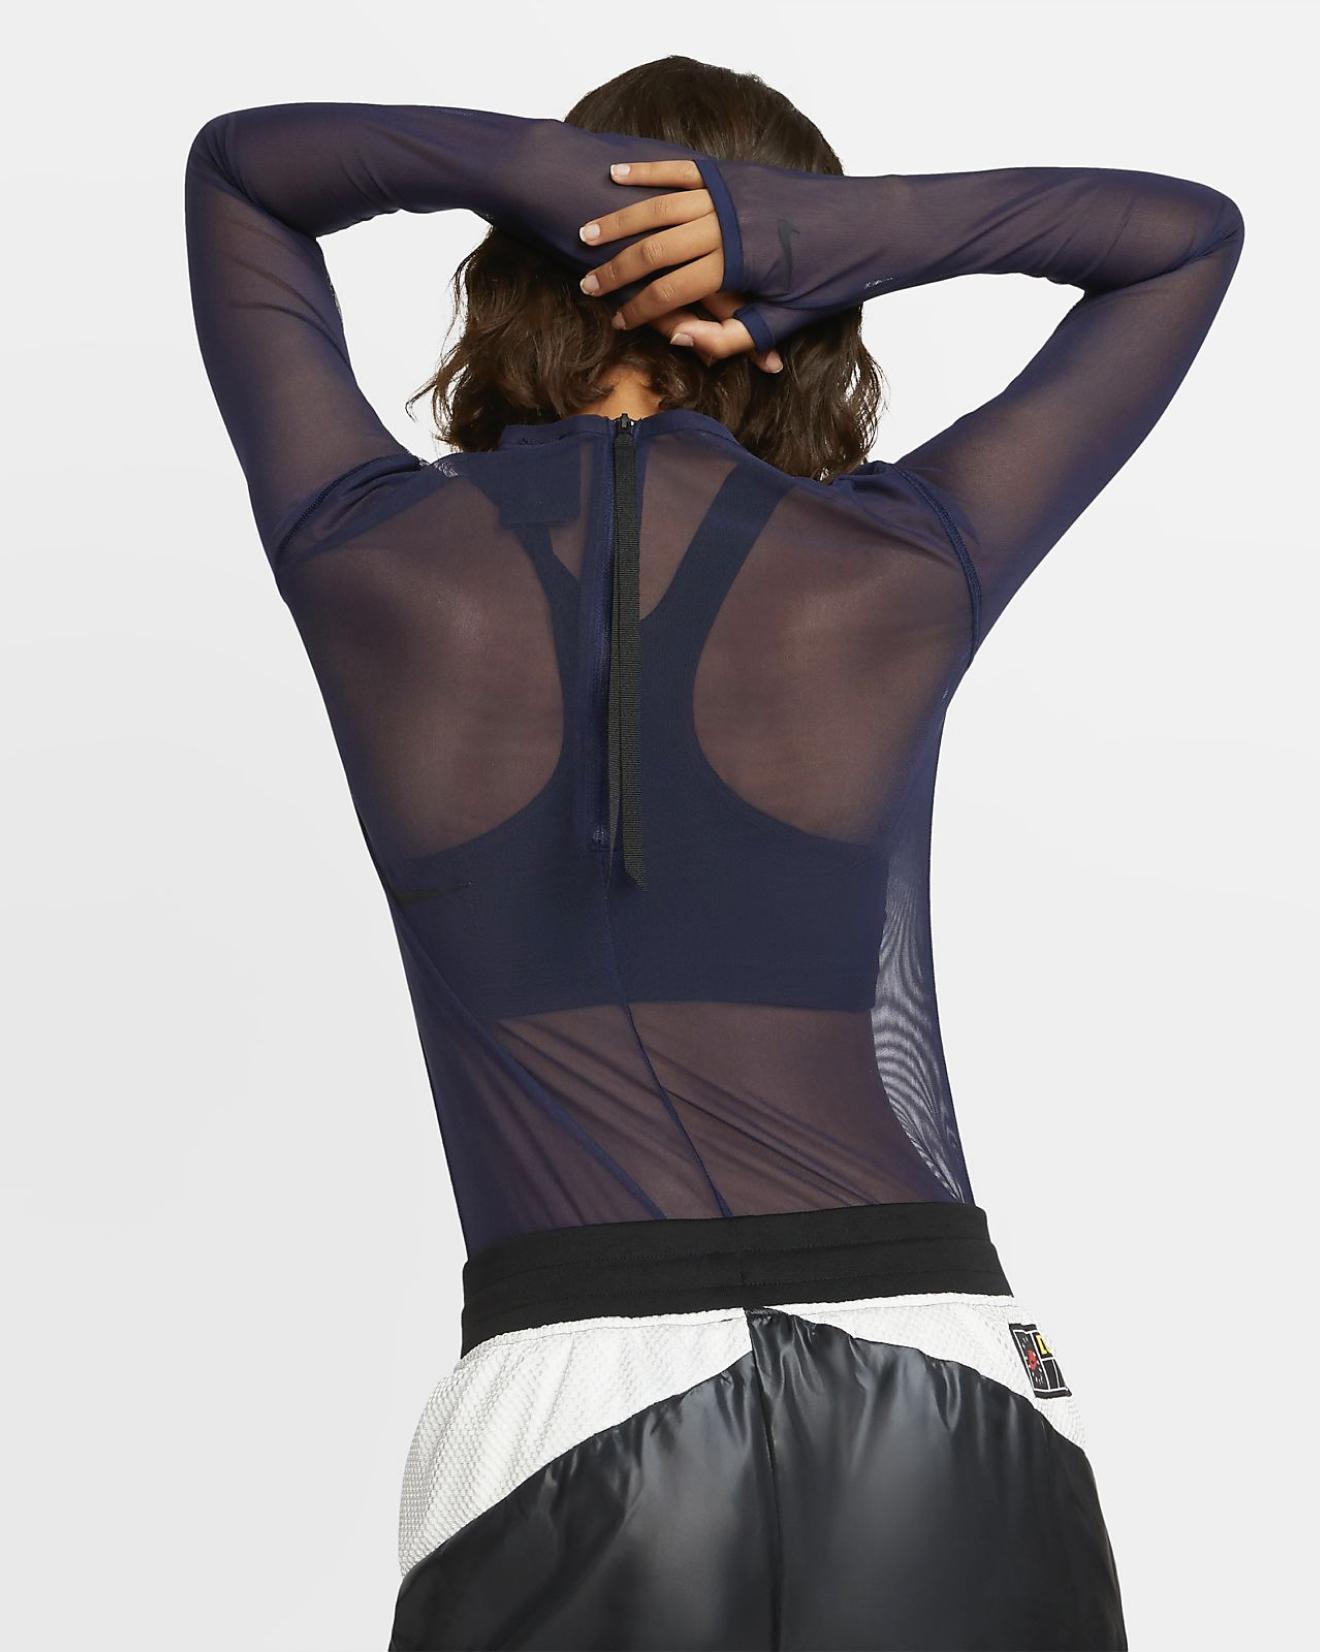 Nike Product Wall